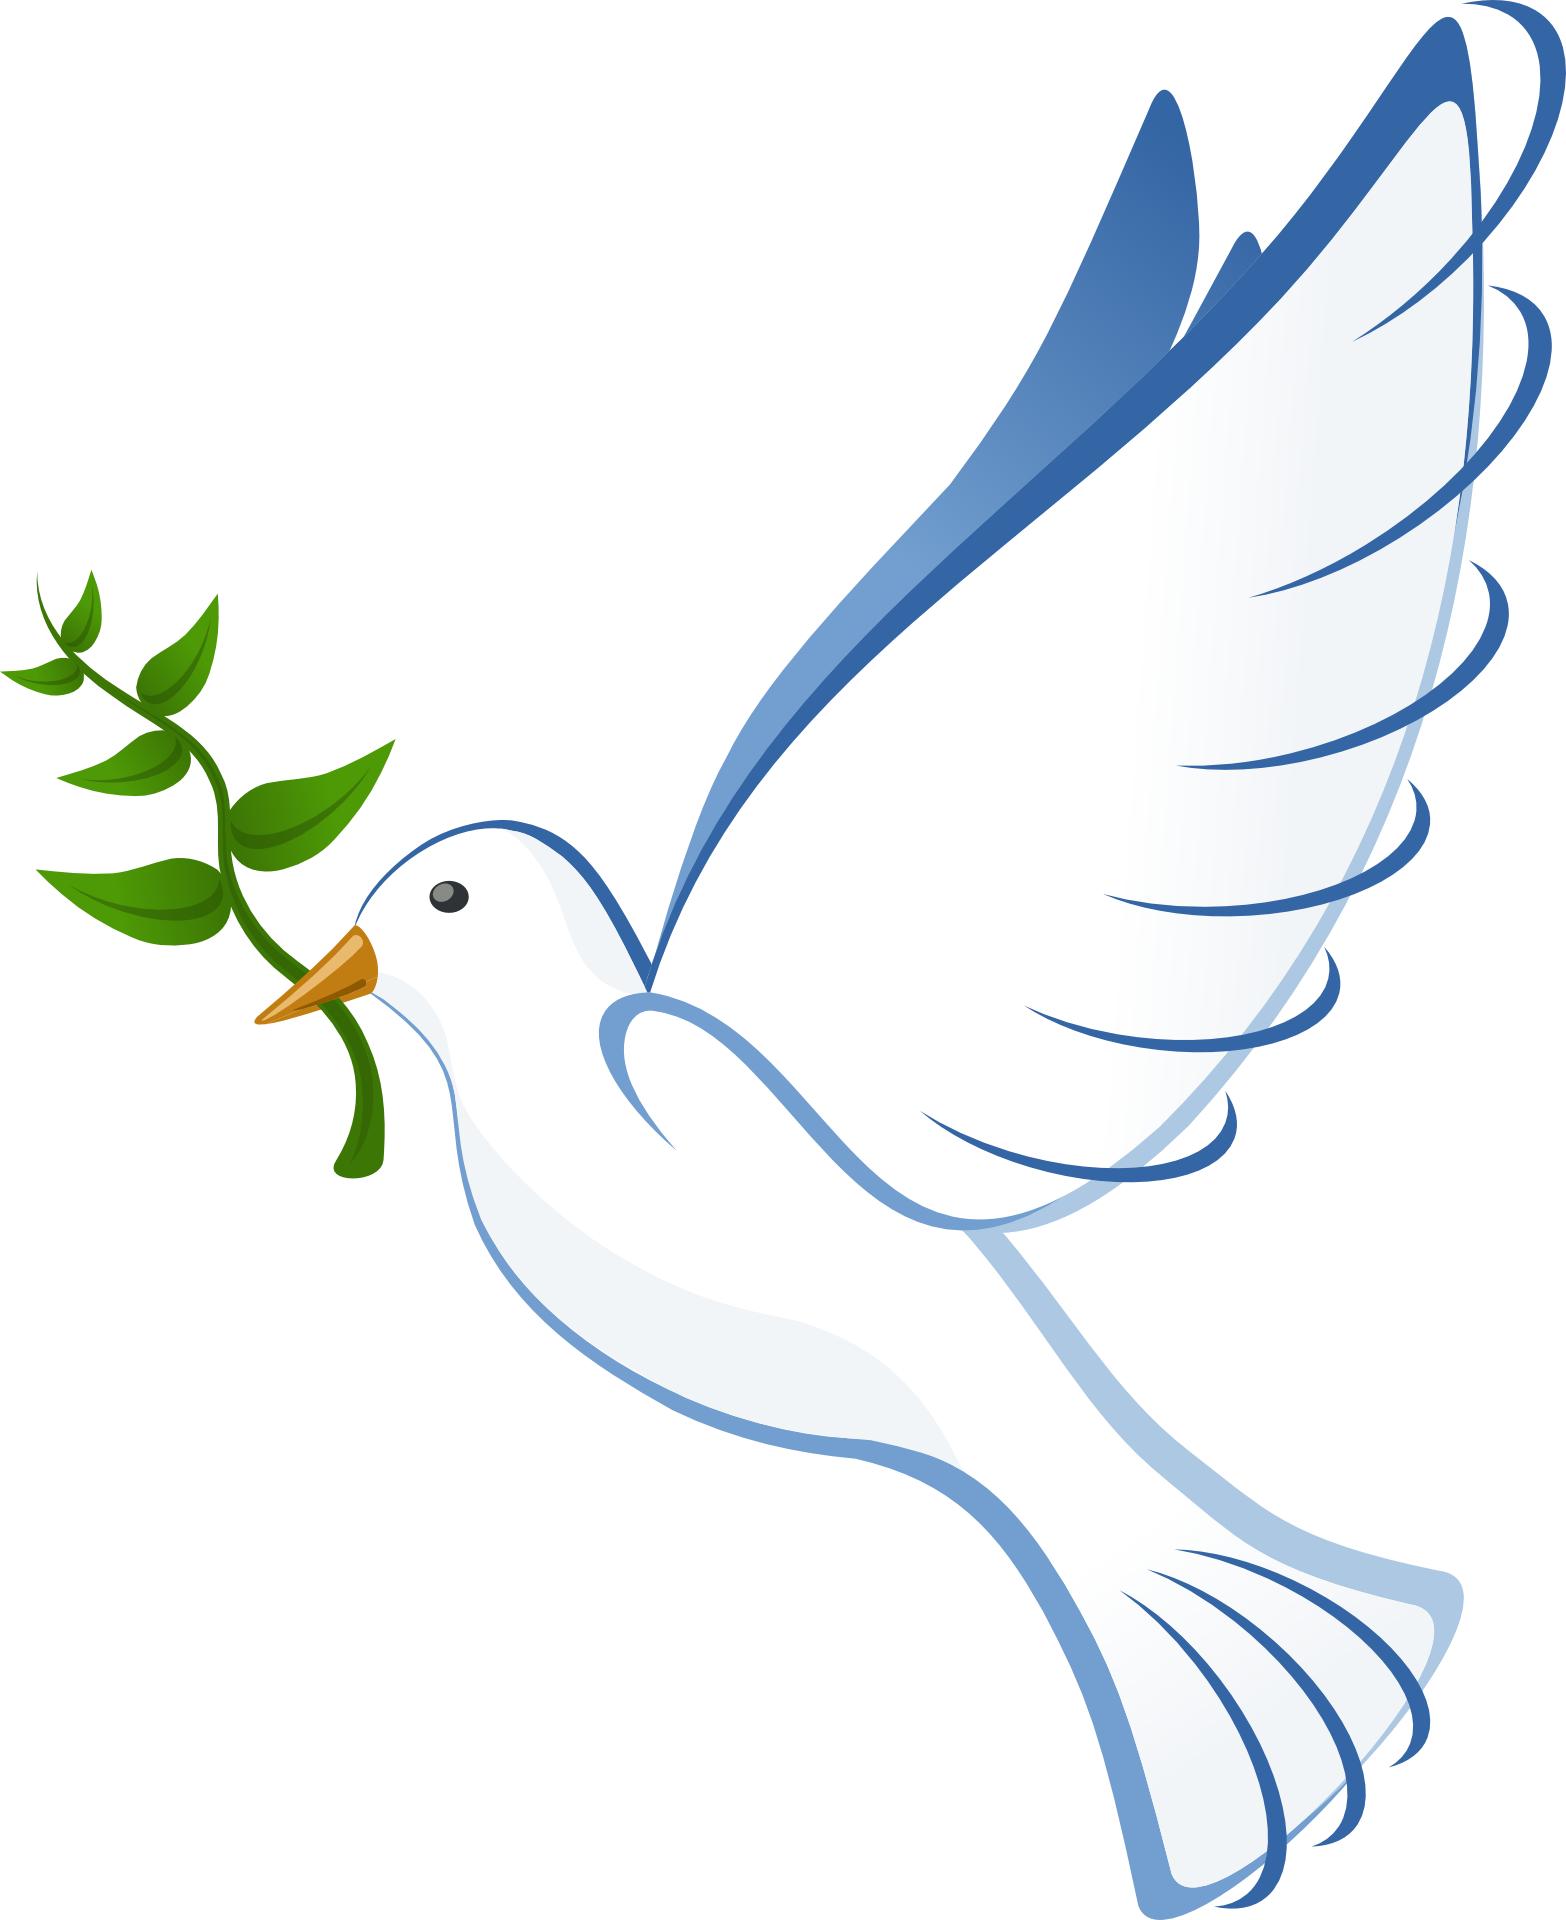 Dove bird peace sign - photo#1